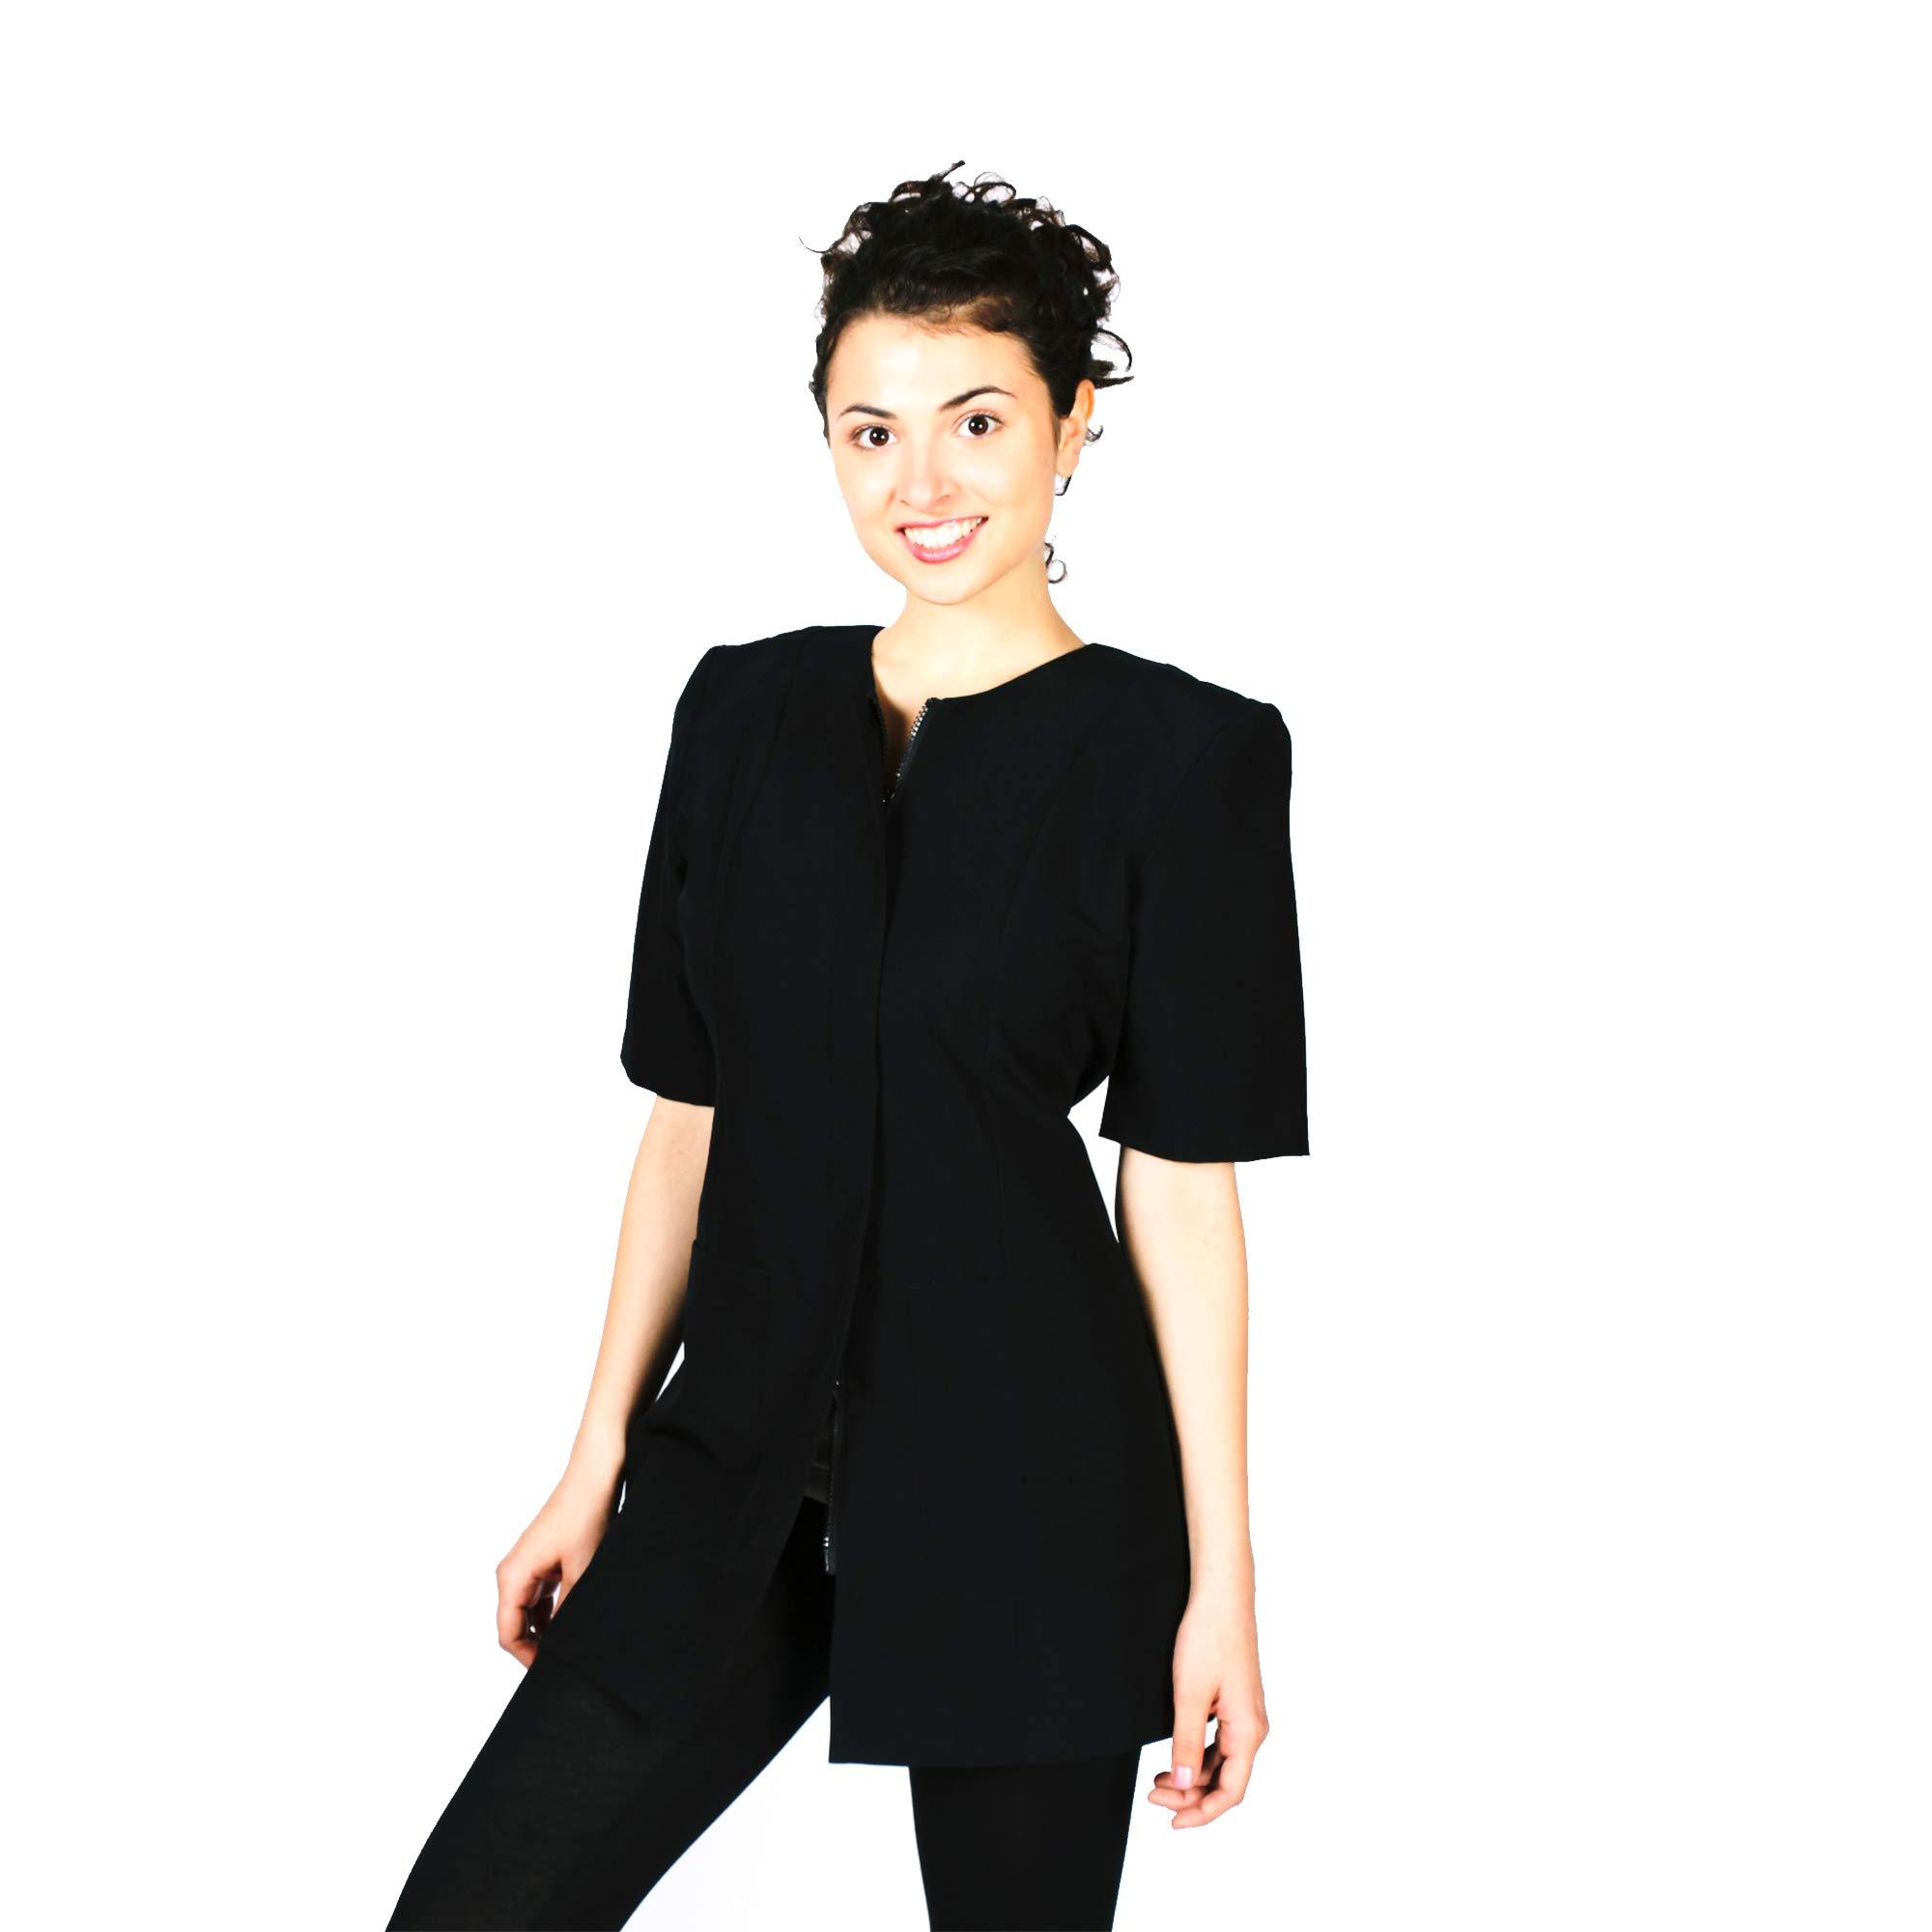 Smockers Cathy Professional Salon Smock Stylist Jacket Cosmetology Uniform